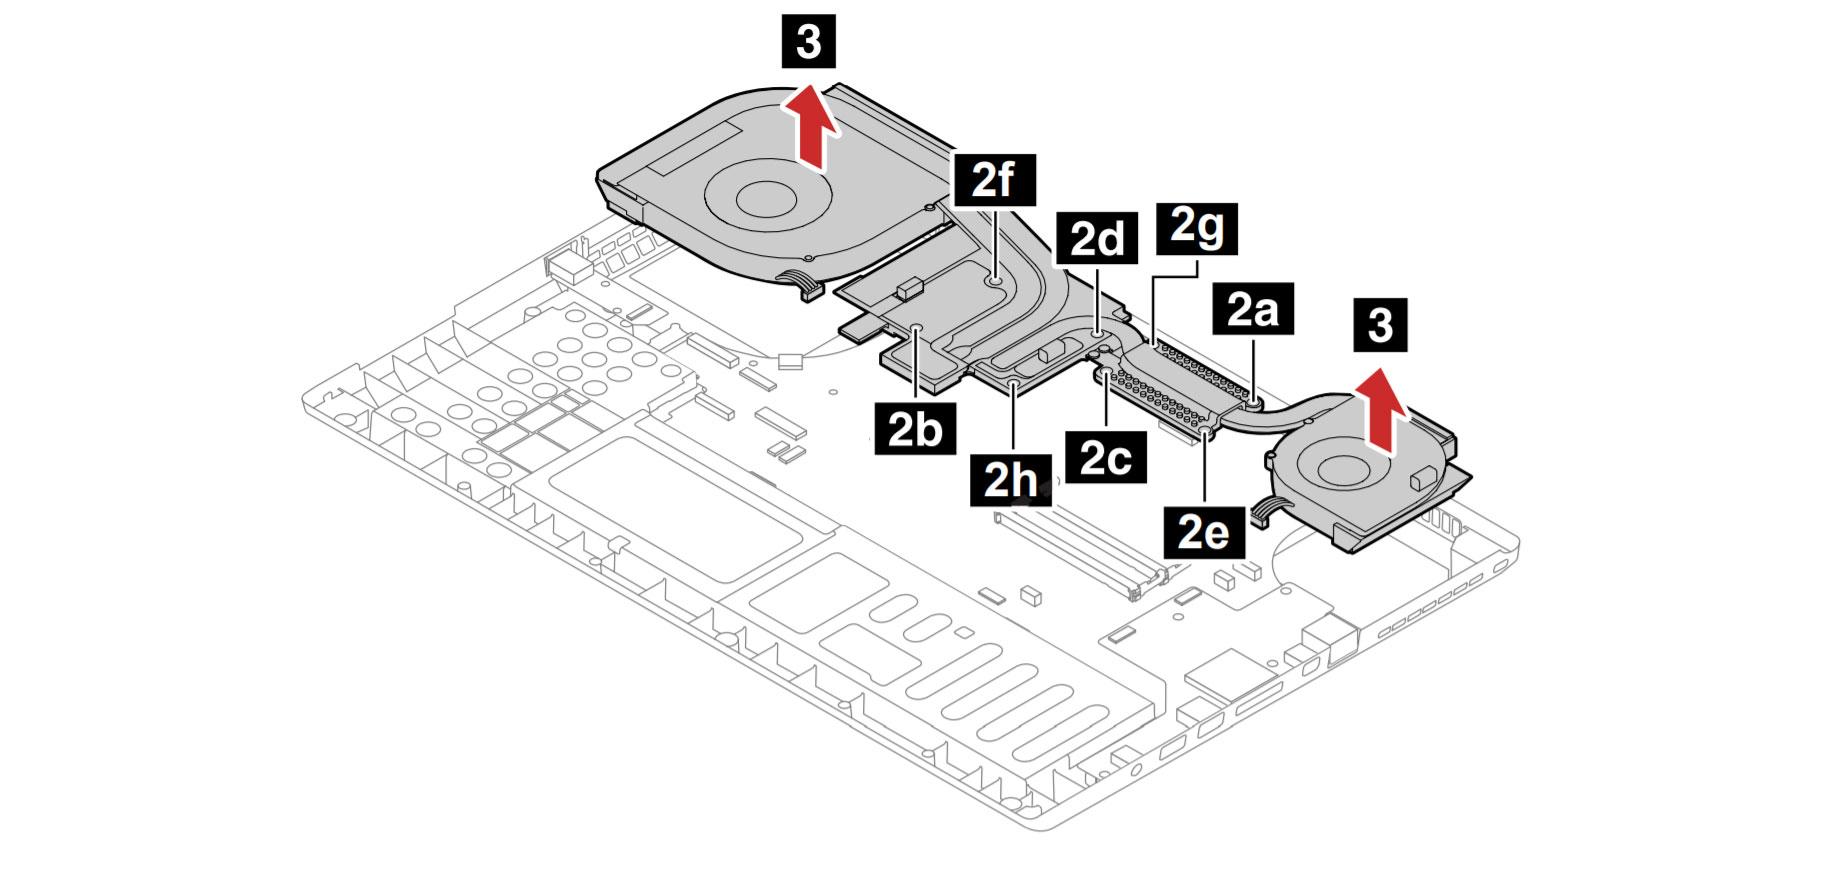 Lenovo ThinkPad P73 review (Core i9-9880H, RTX Quadro 4000